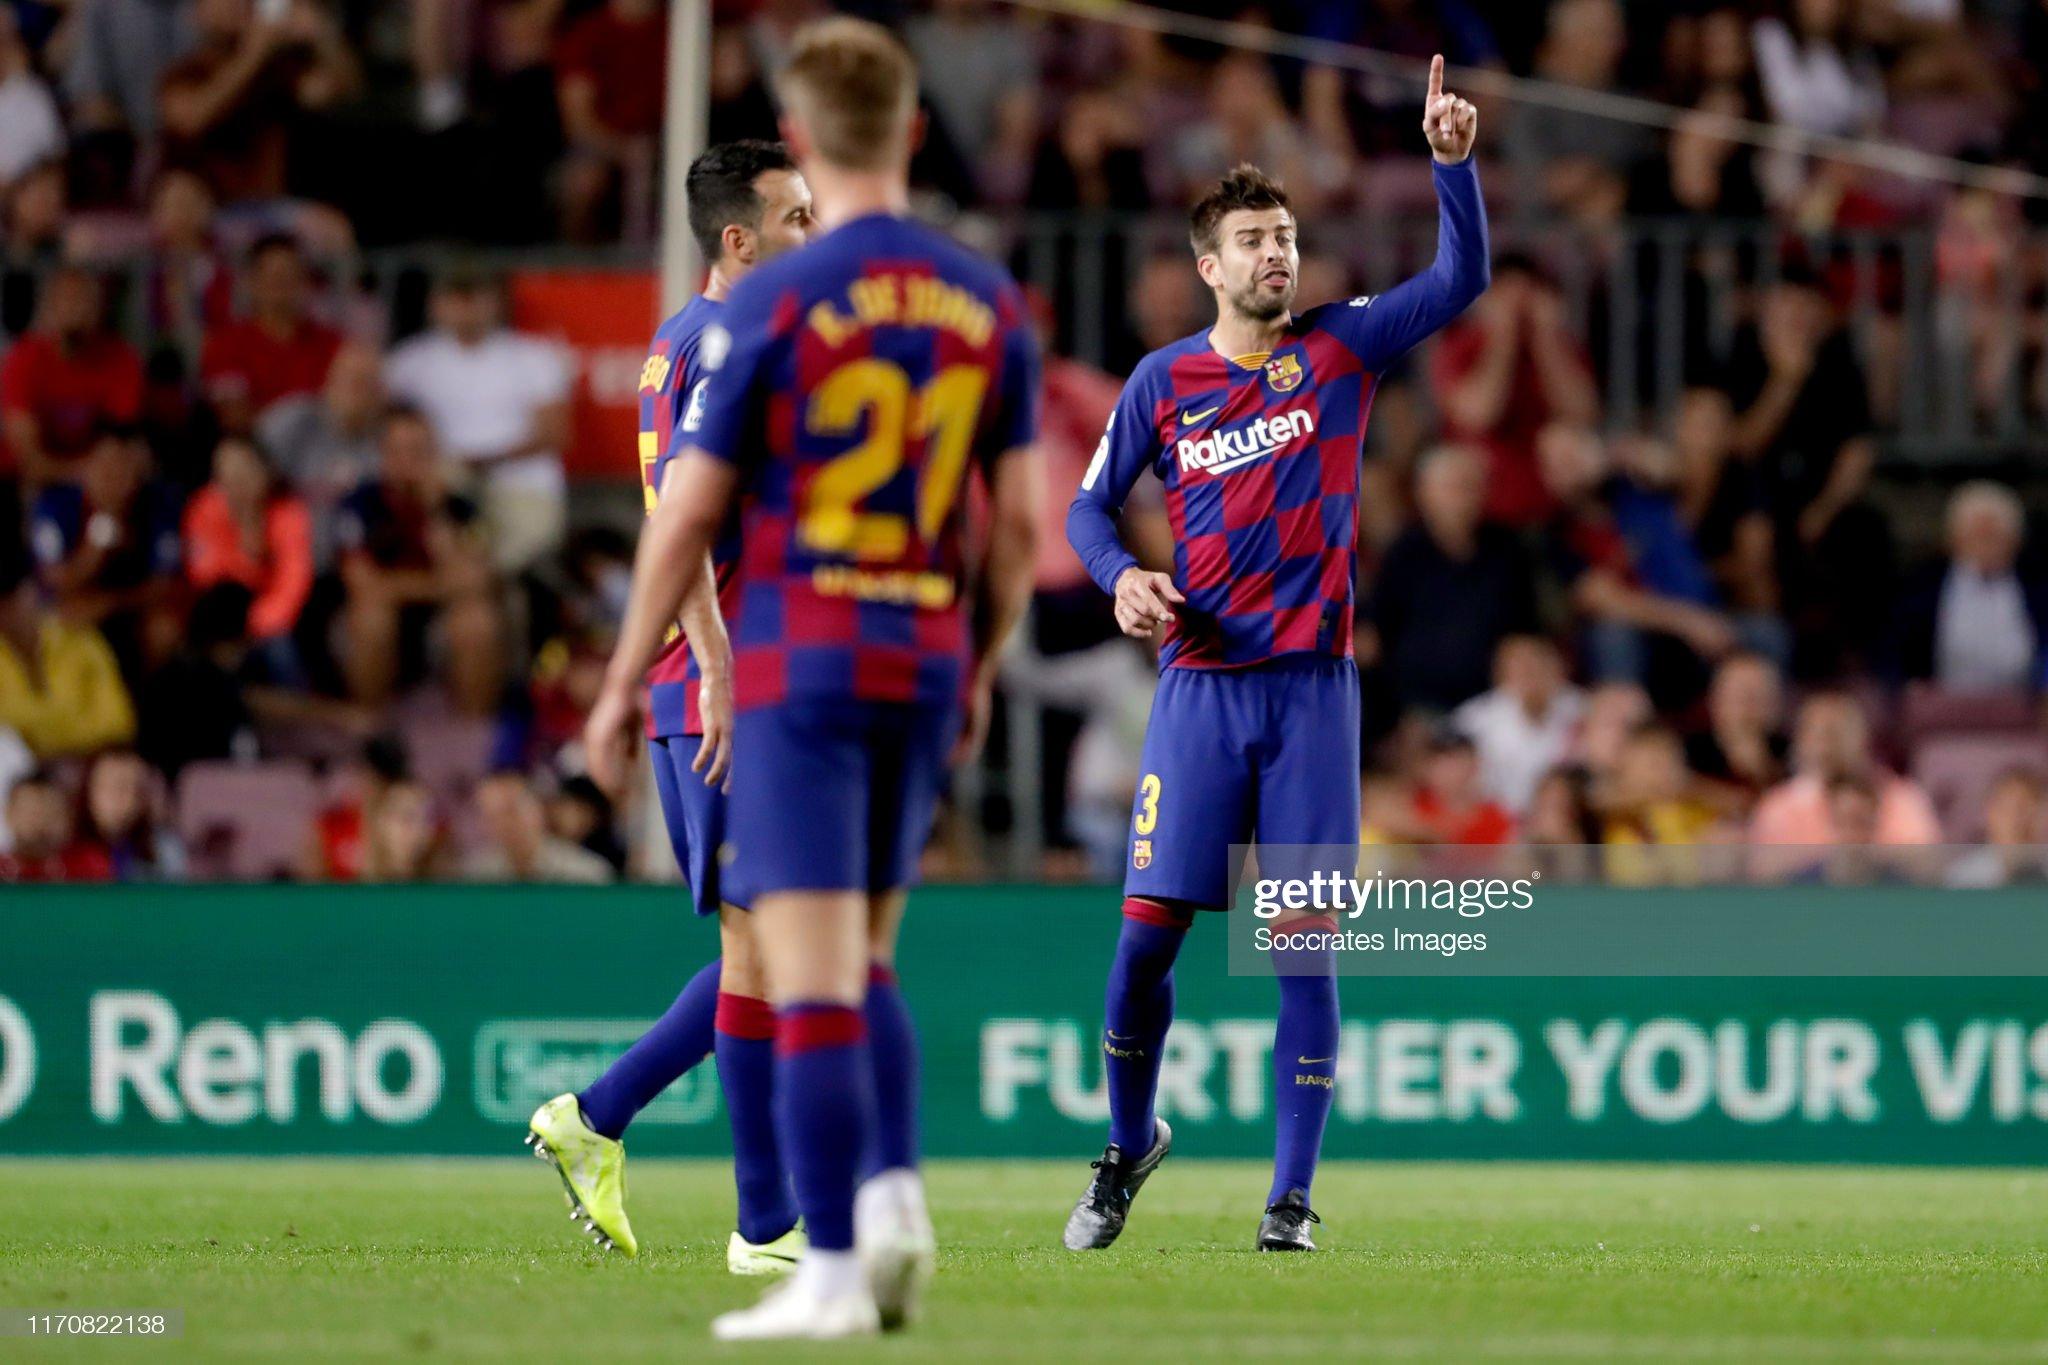 صور مباراة : برشلونة - فياريال 2-1 ( 24-09-2019 )  Gerard-pique-of-fc-barcelona-during-the-la-liga-santander-match-fc-picture-id1170822138?s=2048x2048